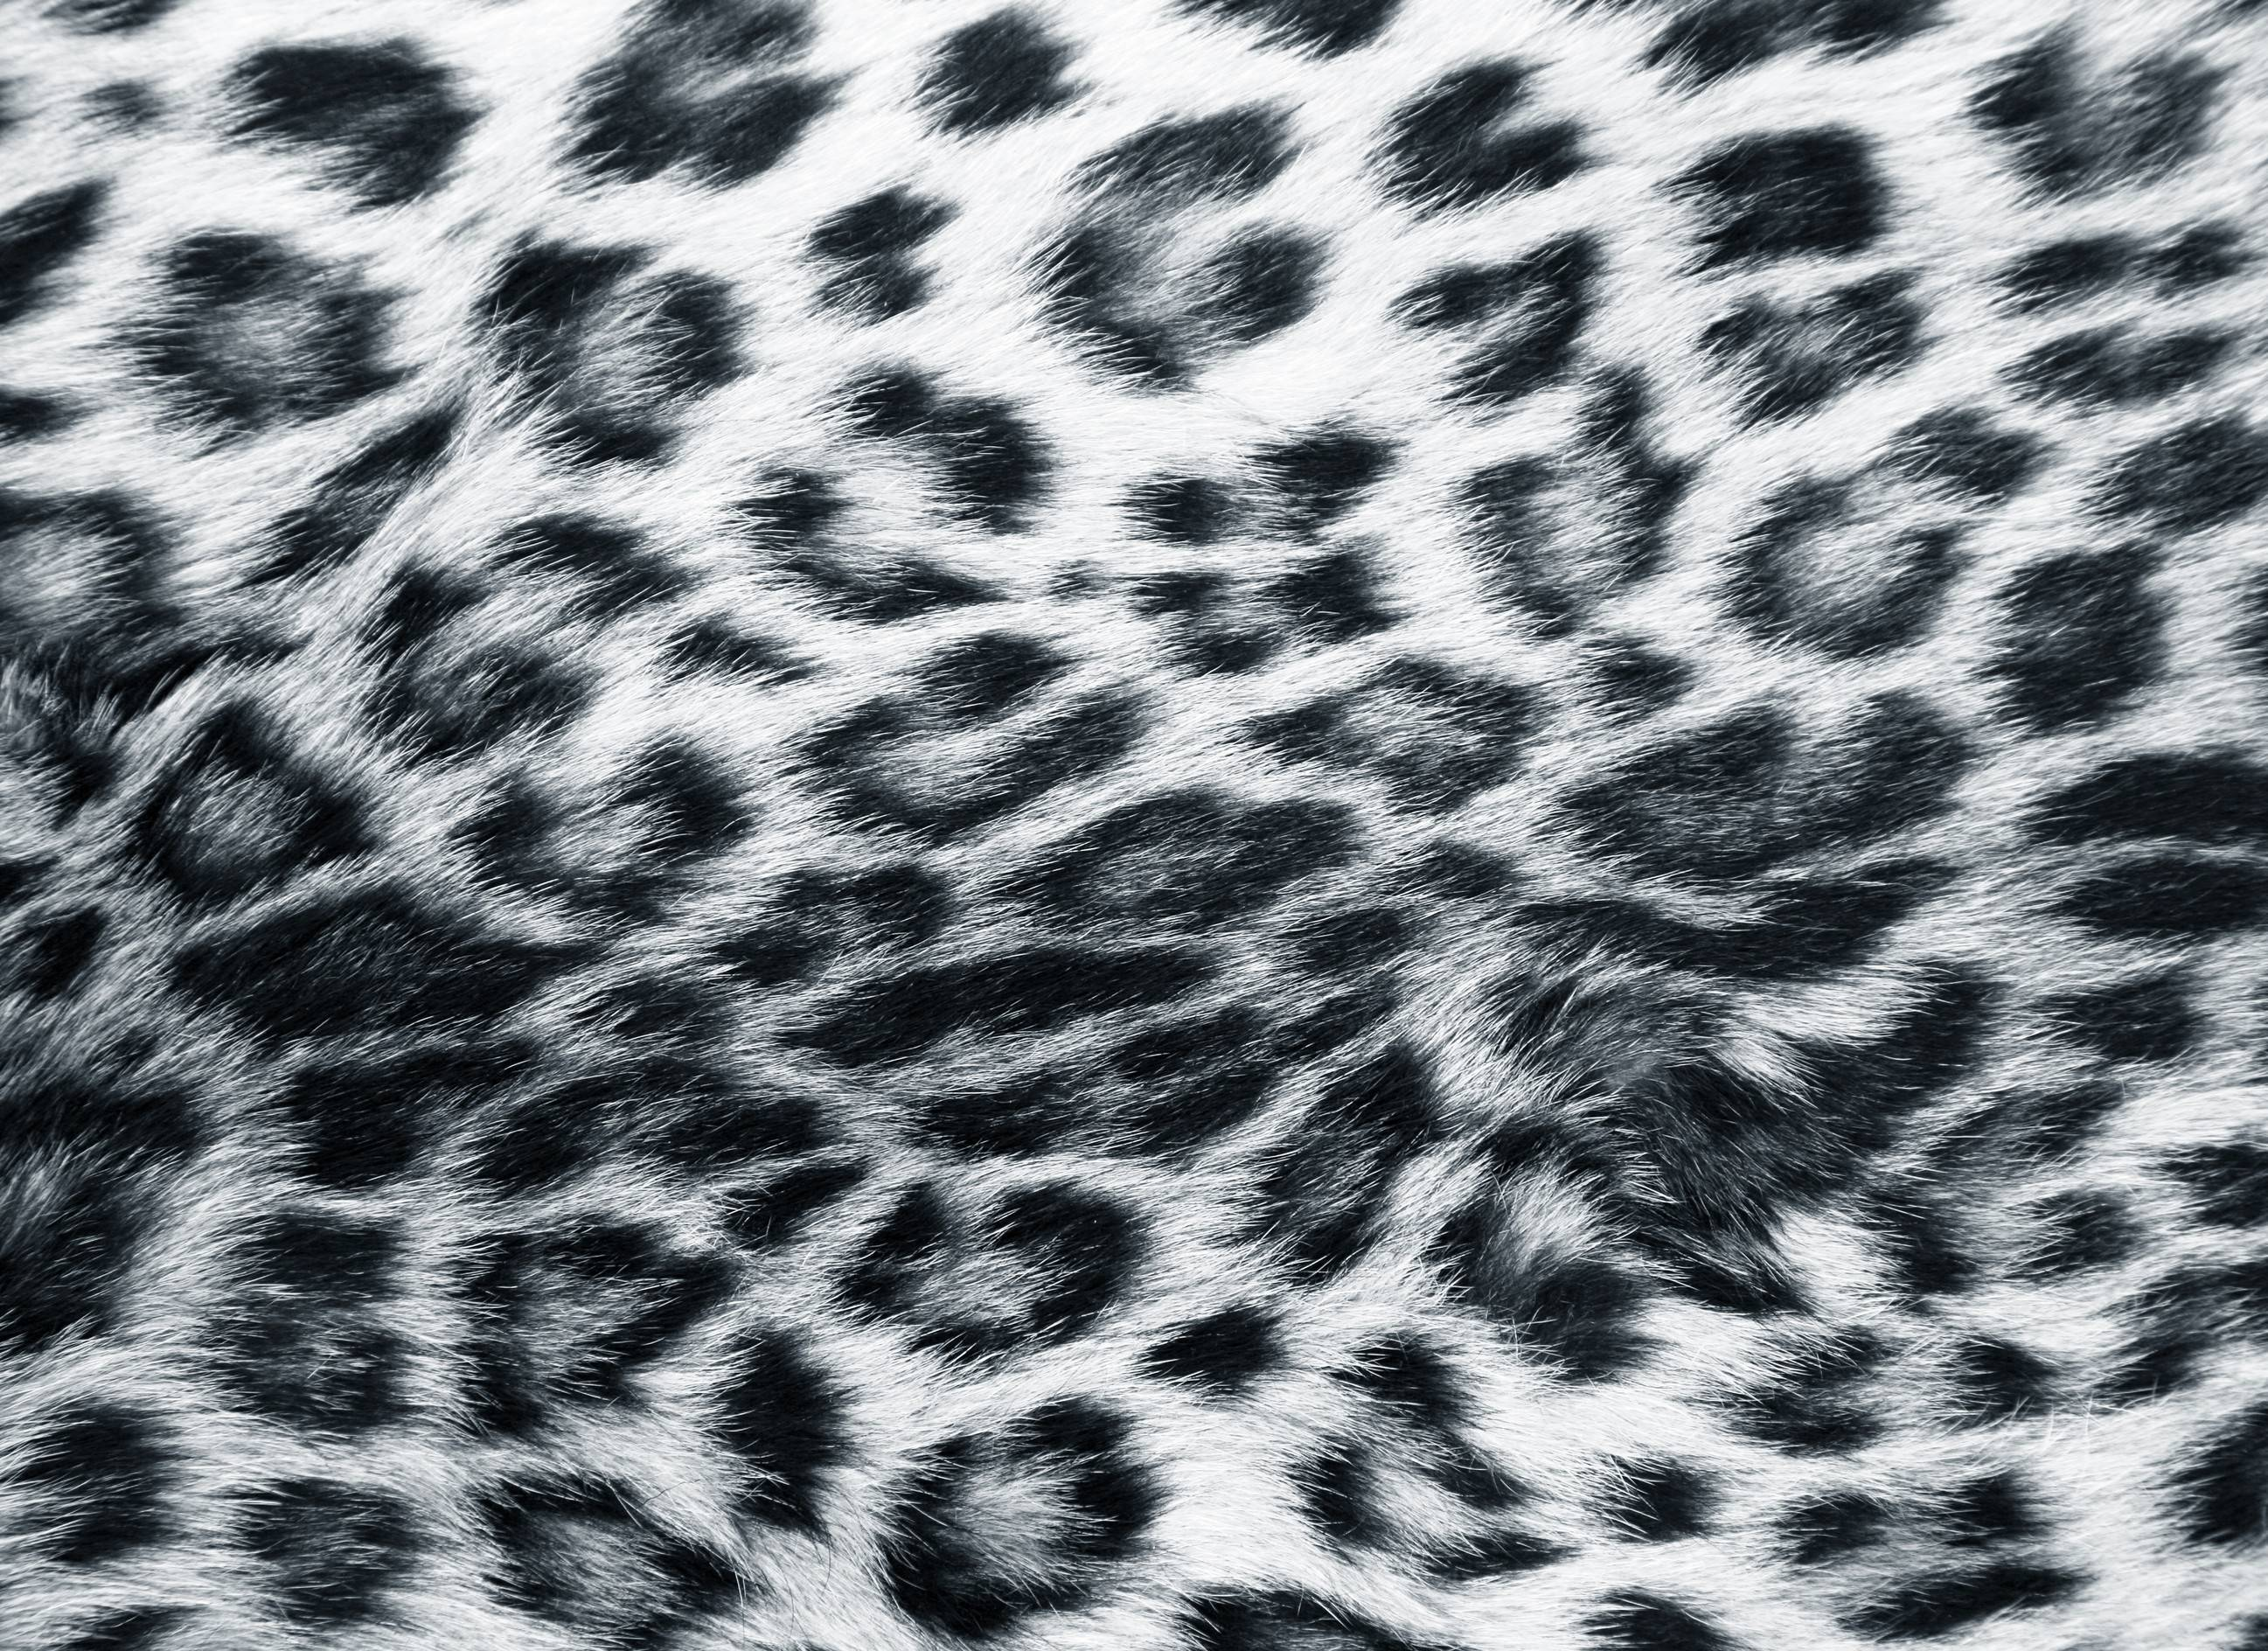 Drawn leopard skin background twitter Desktop Wallpaper Cave For Backgrounds